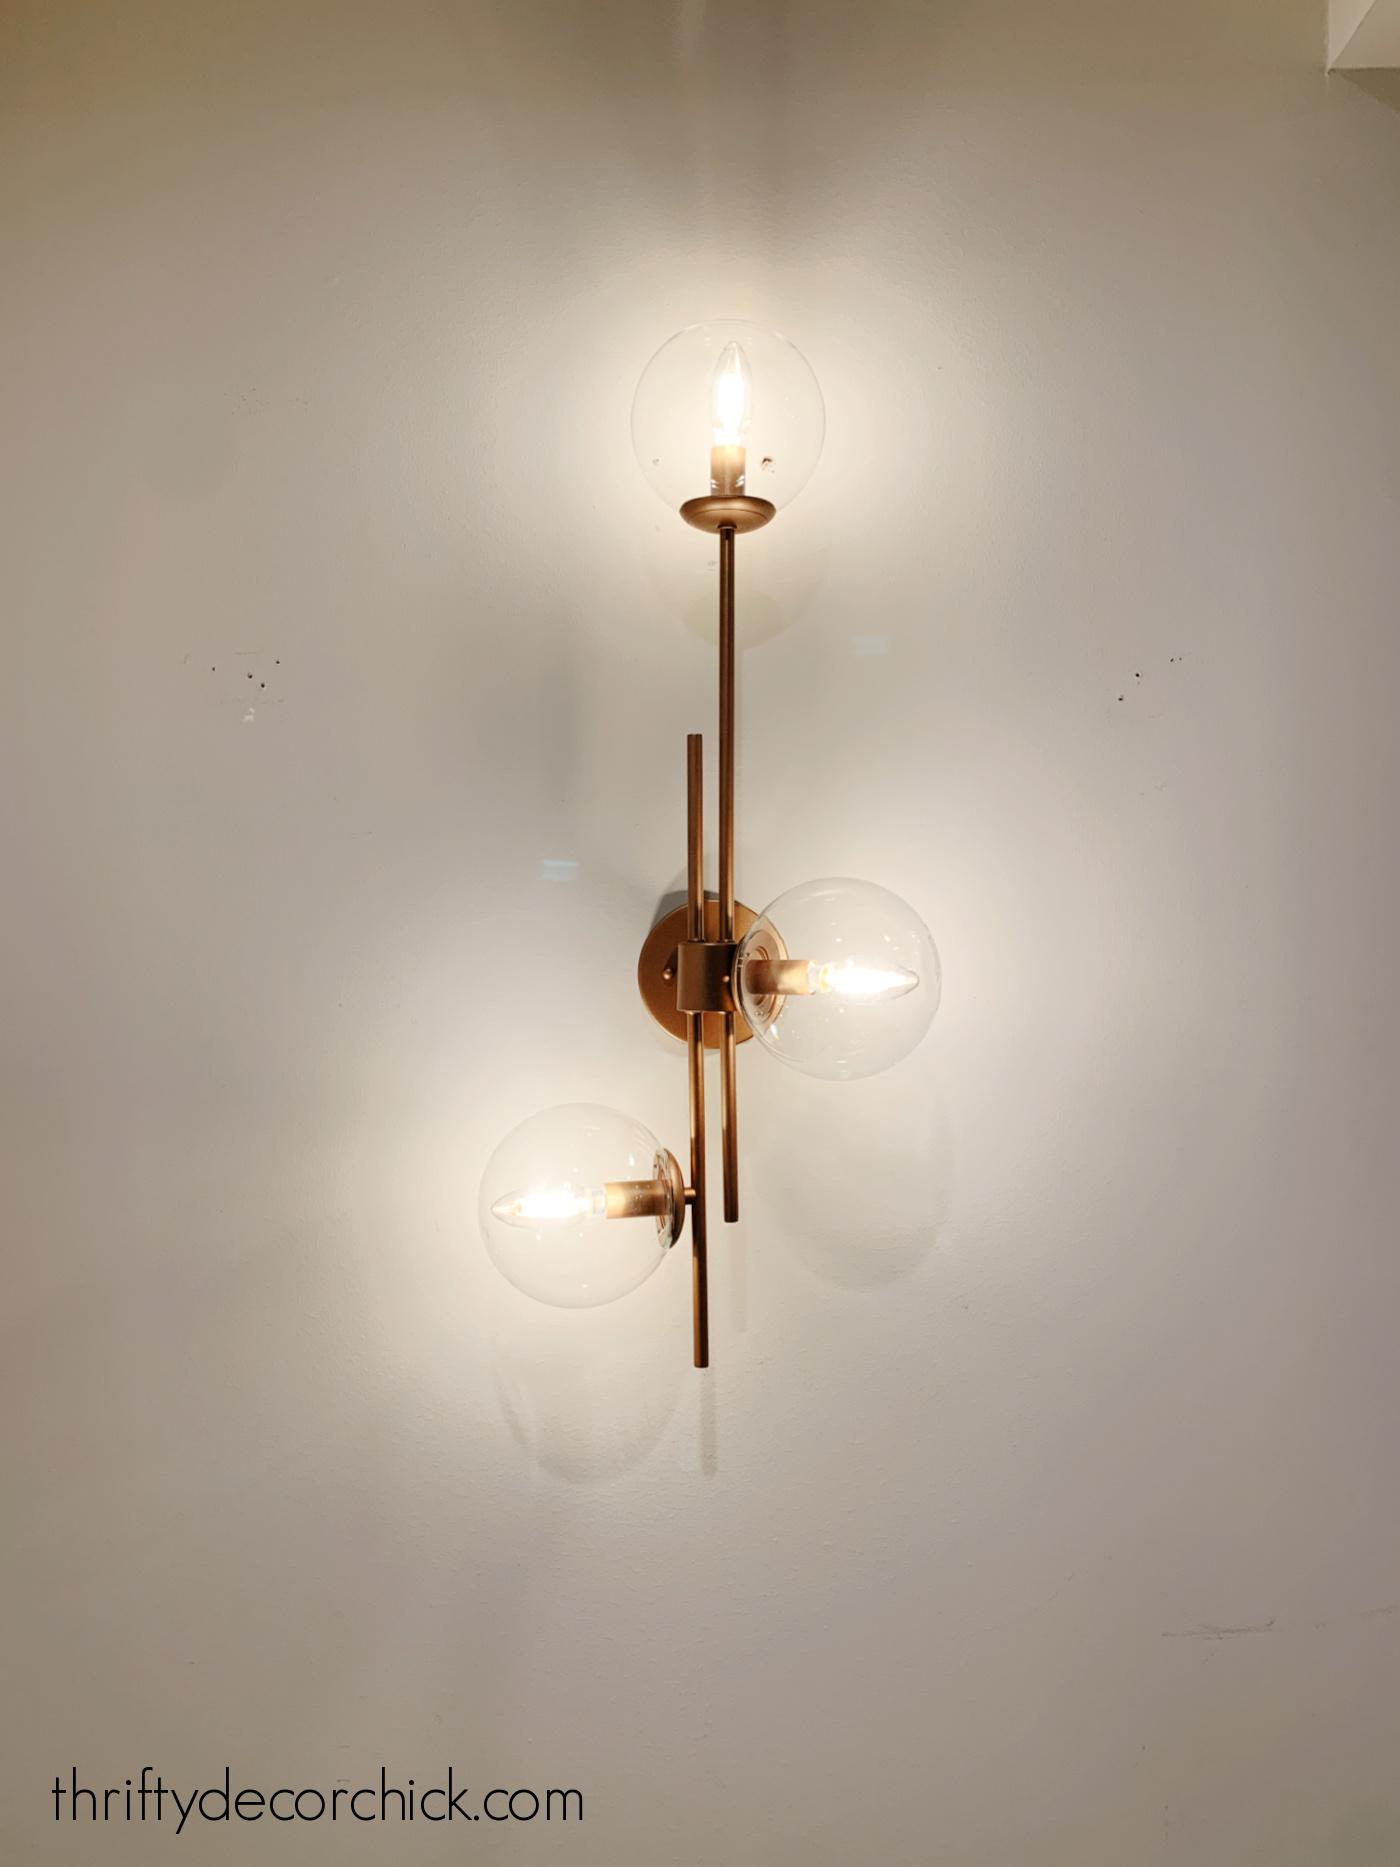 Lowe's Ellan three globe light sconce